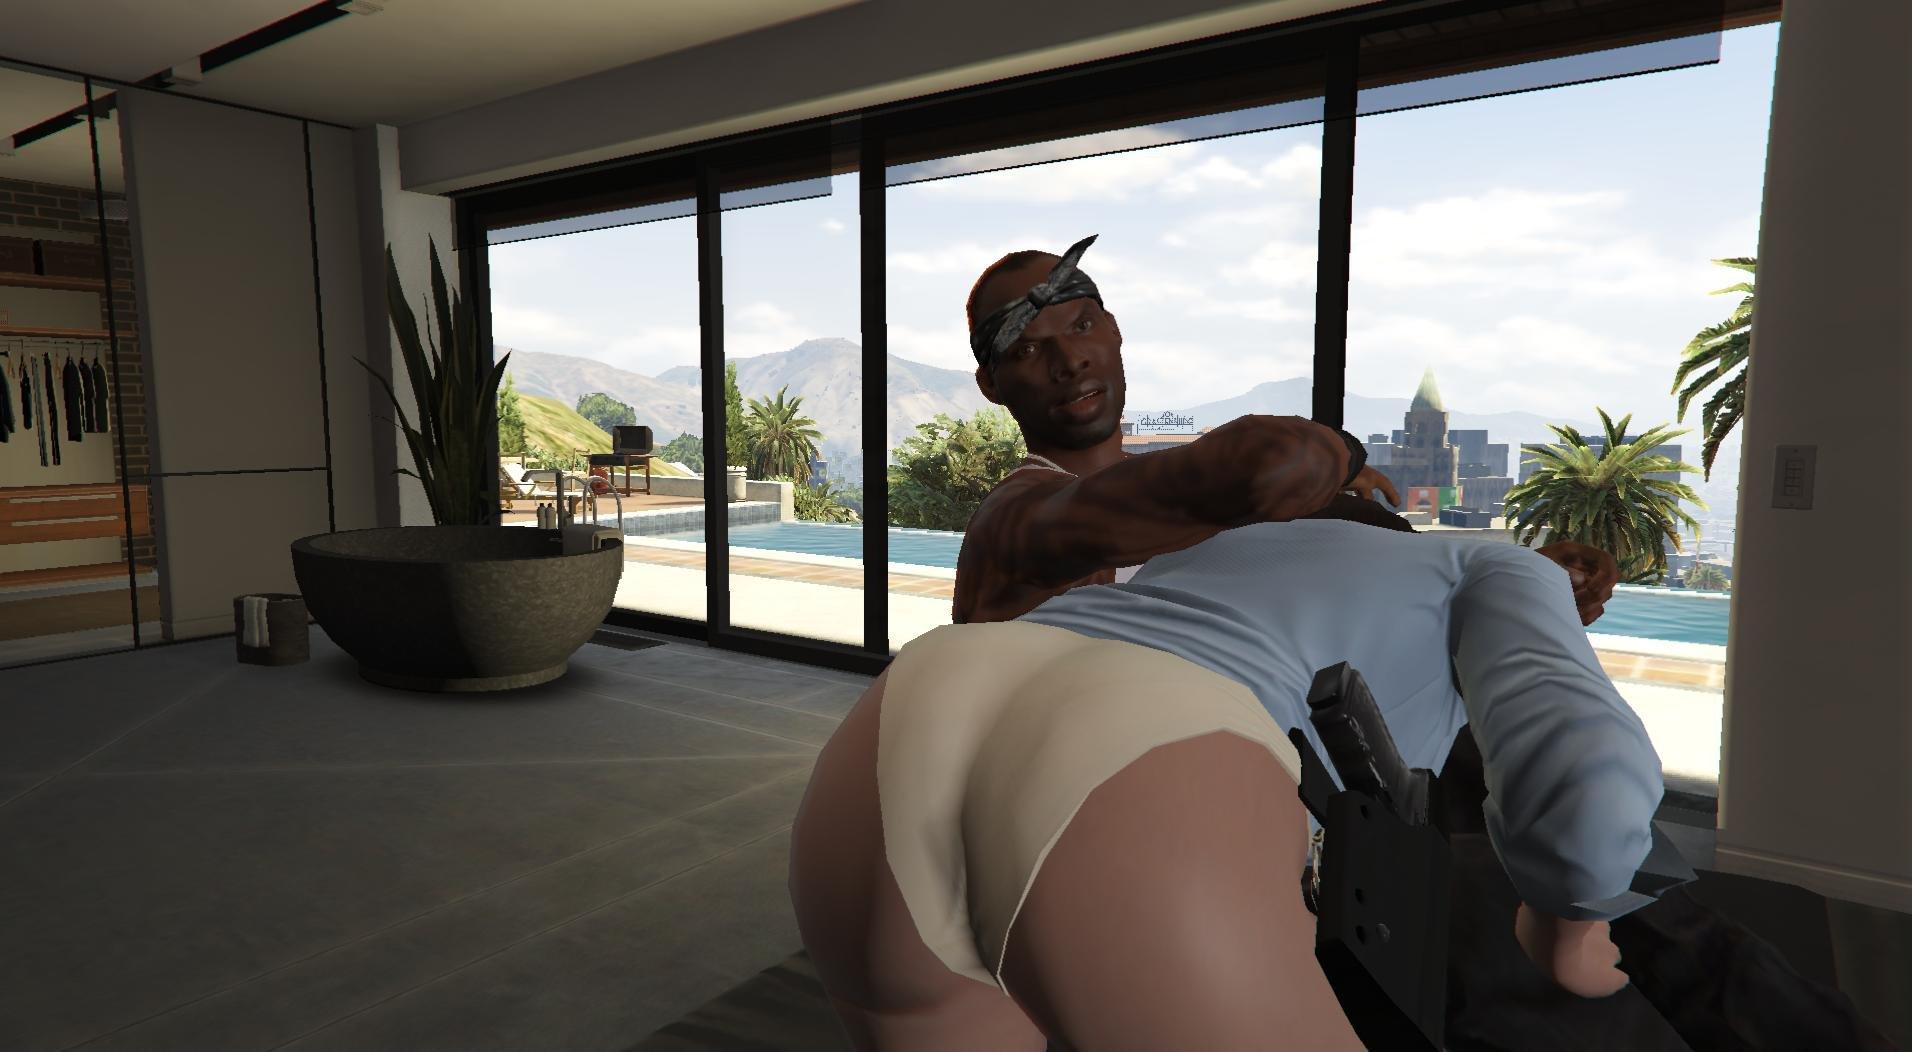 Gratis hd hardcore lesbisk porno